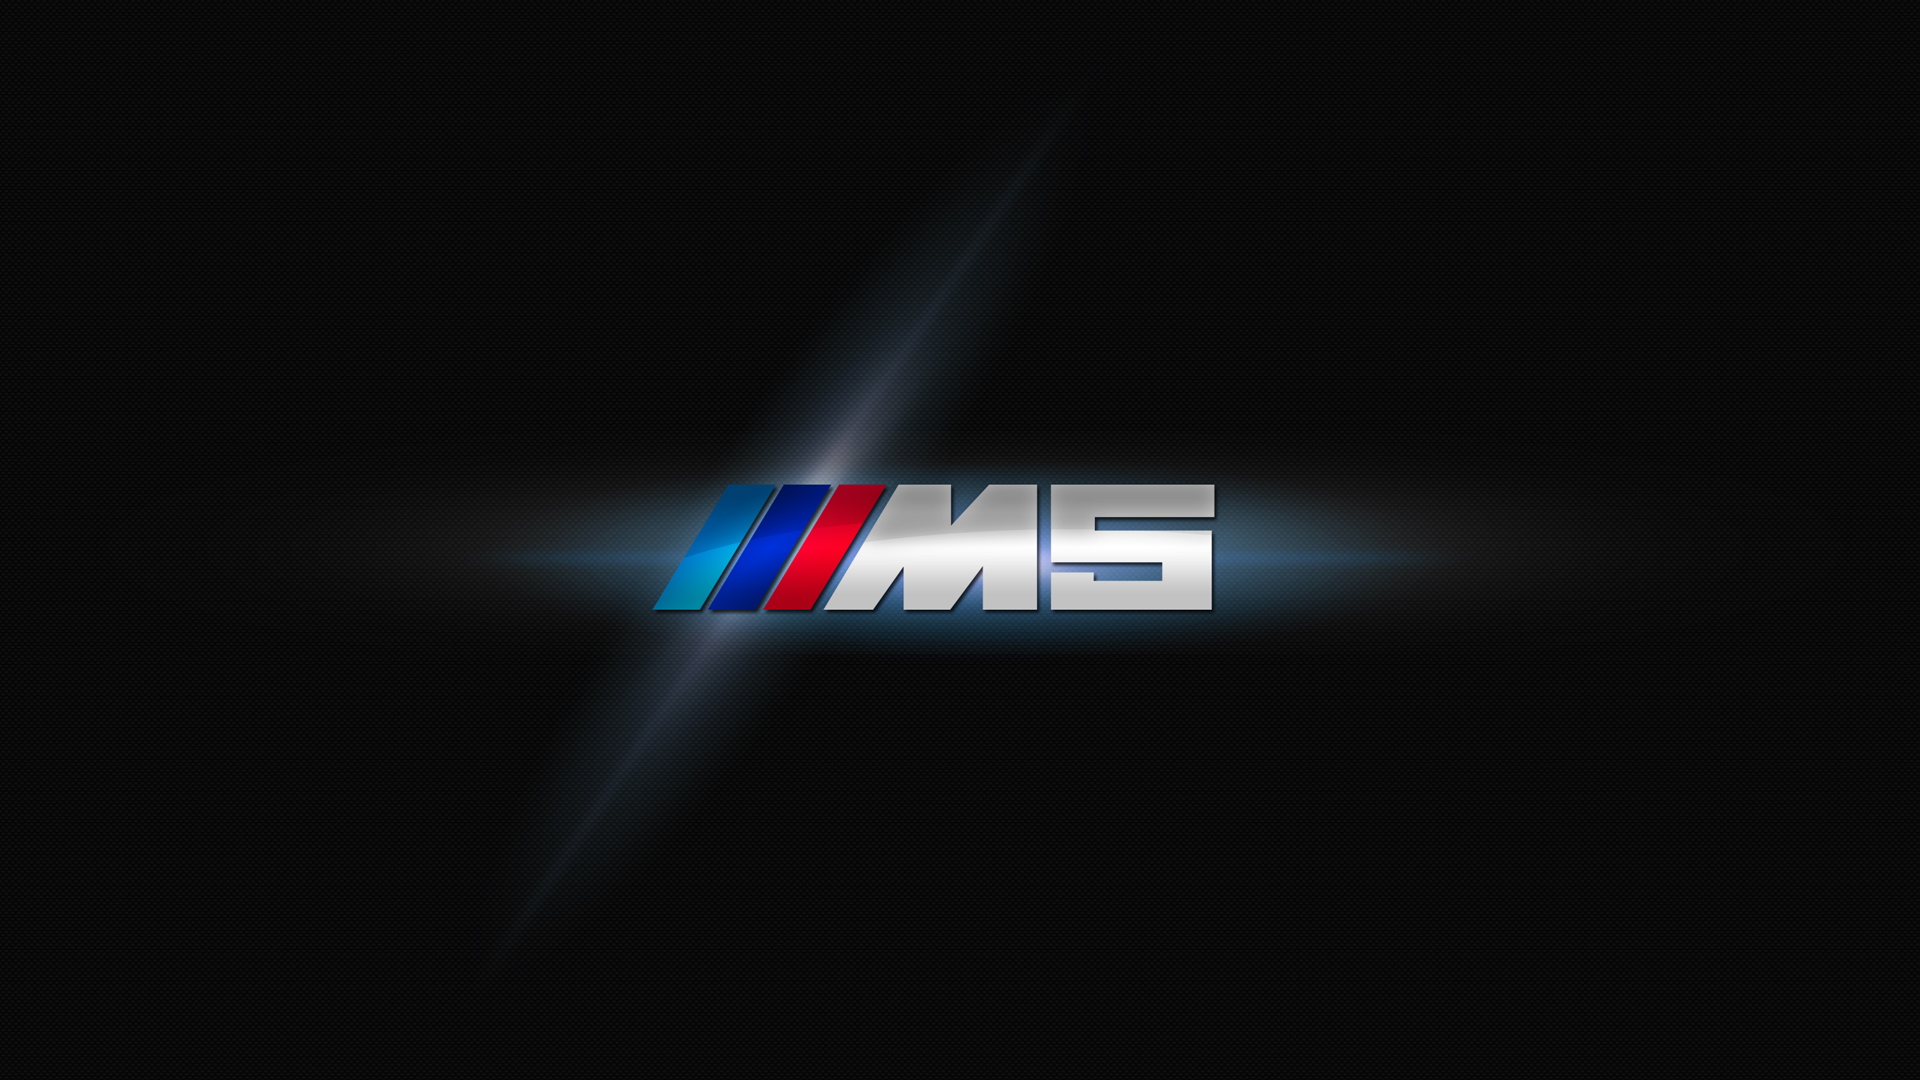 Bmw M5 Logo fond ecran hd 1920x1080